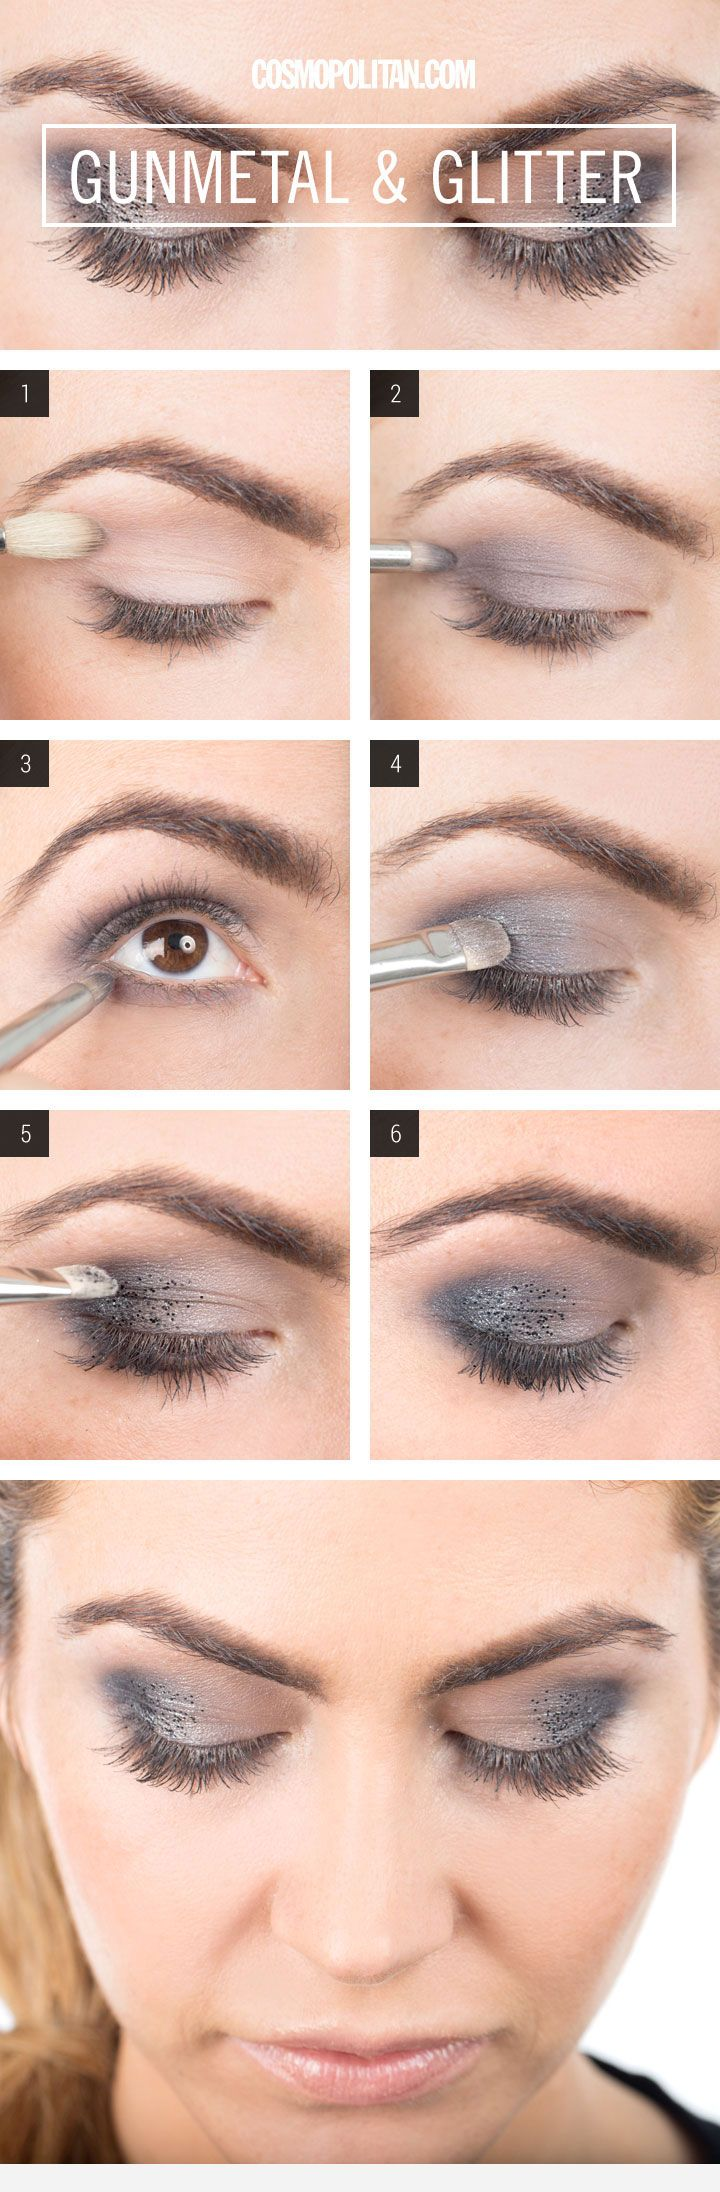 gunmetal-and-glitter-eyeshadow-